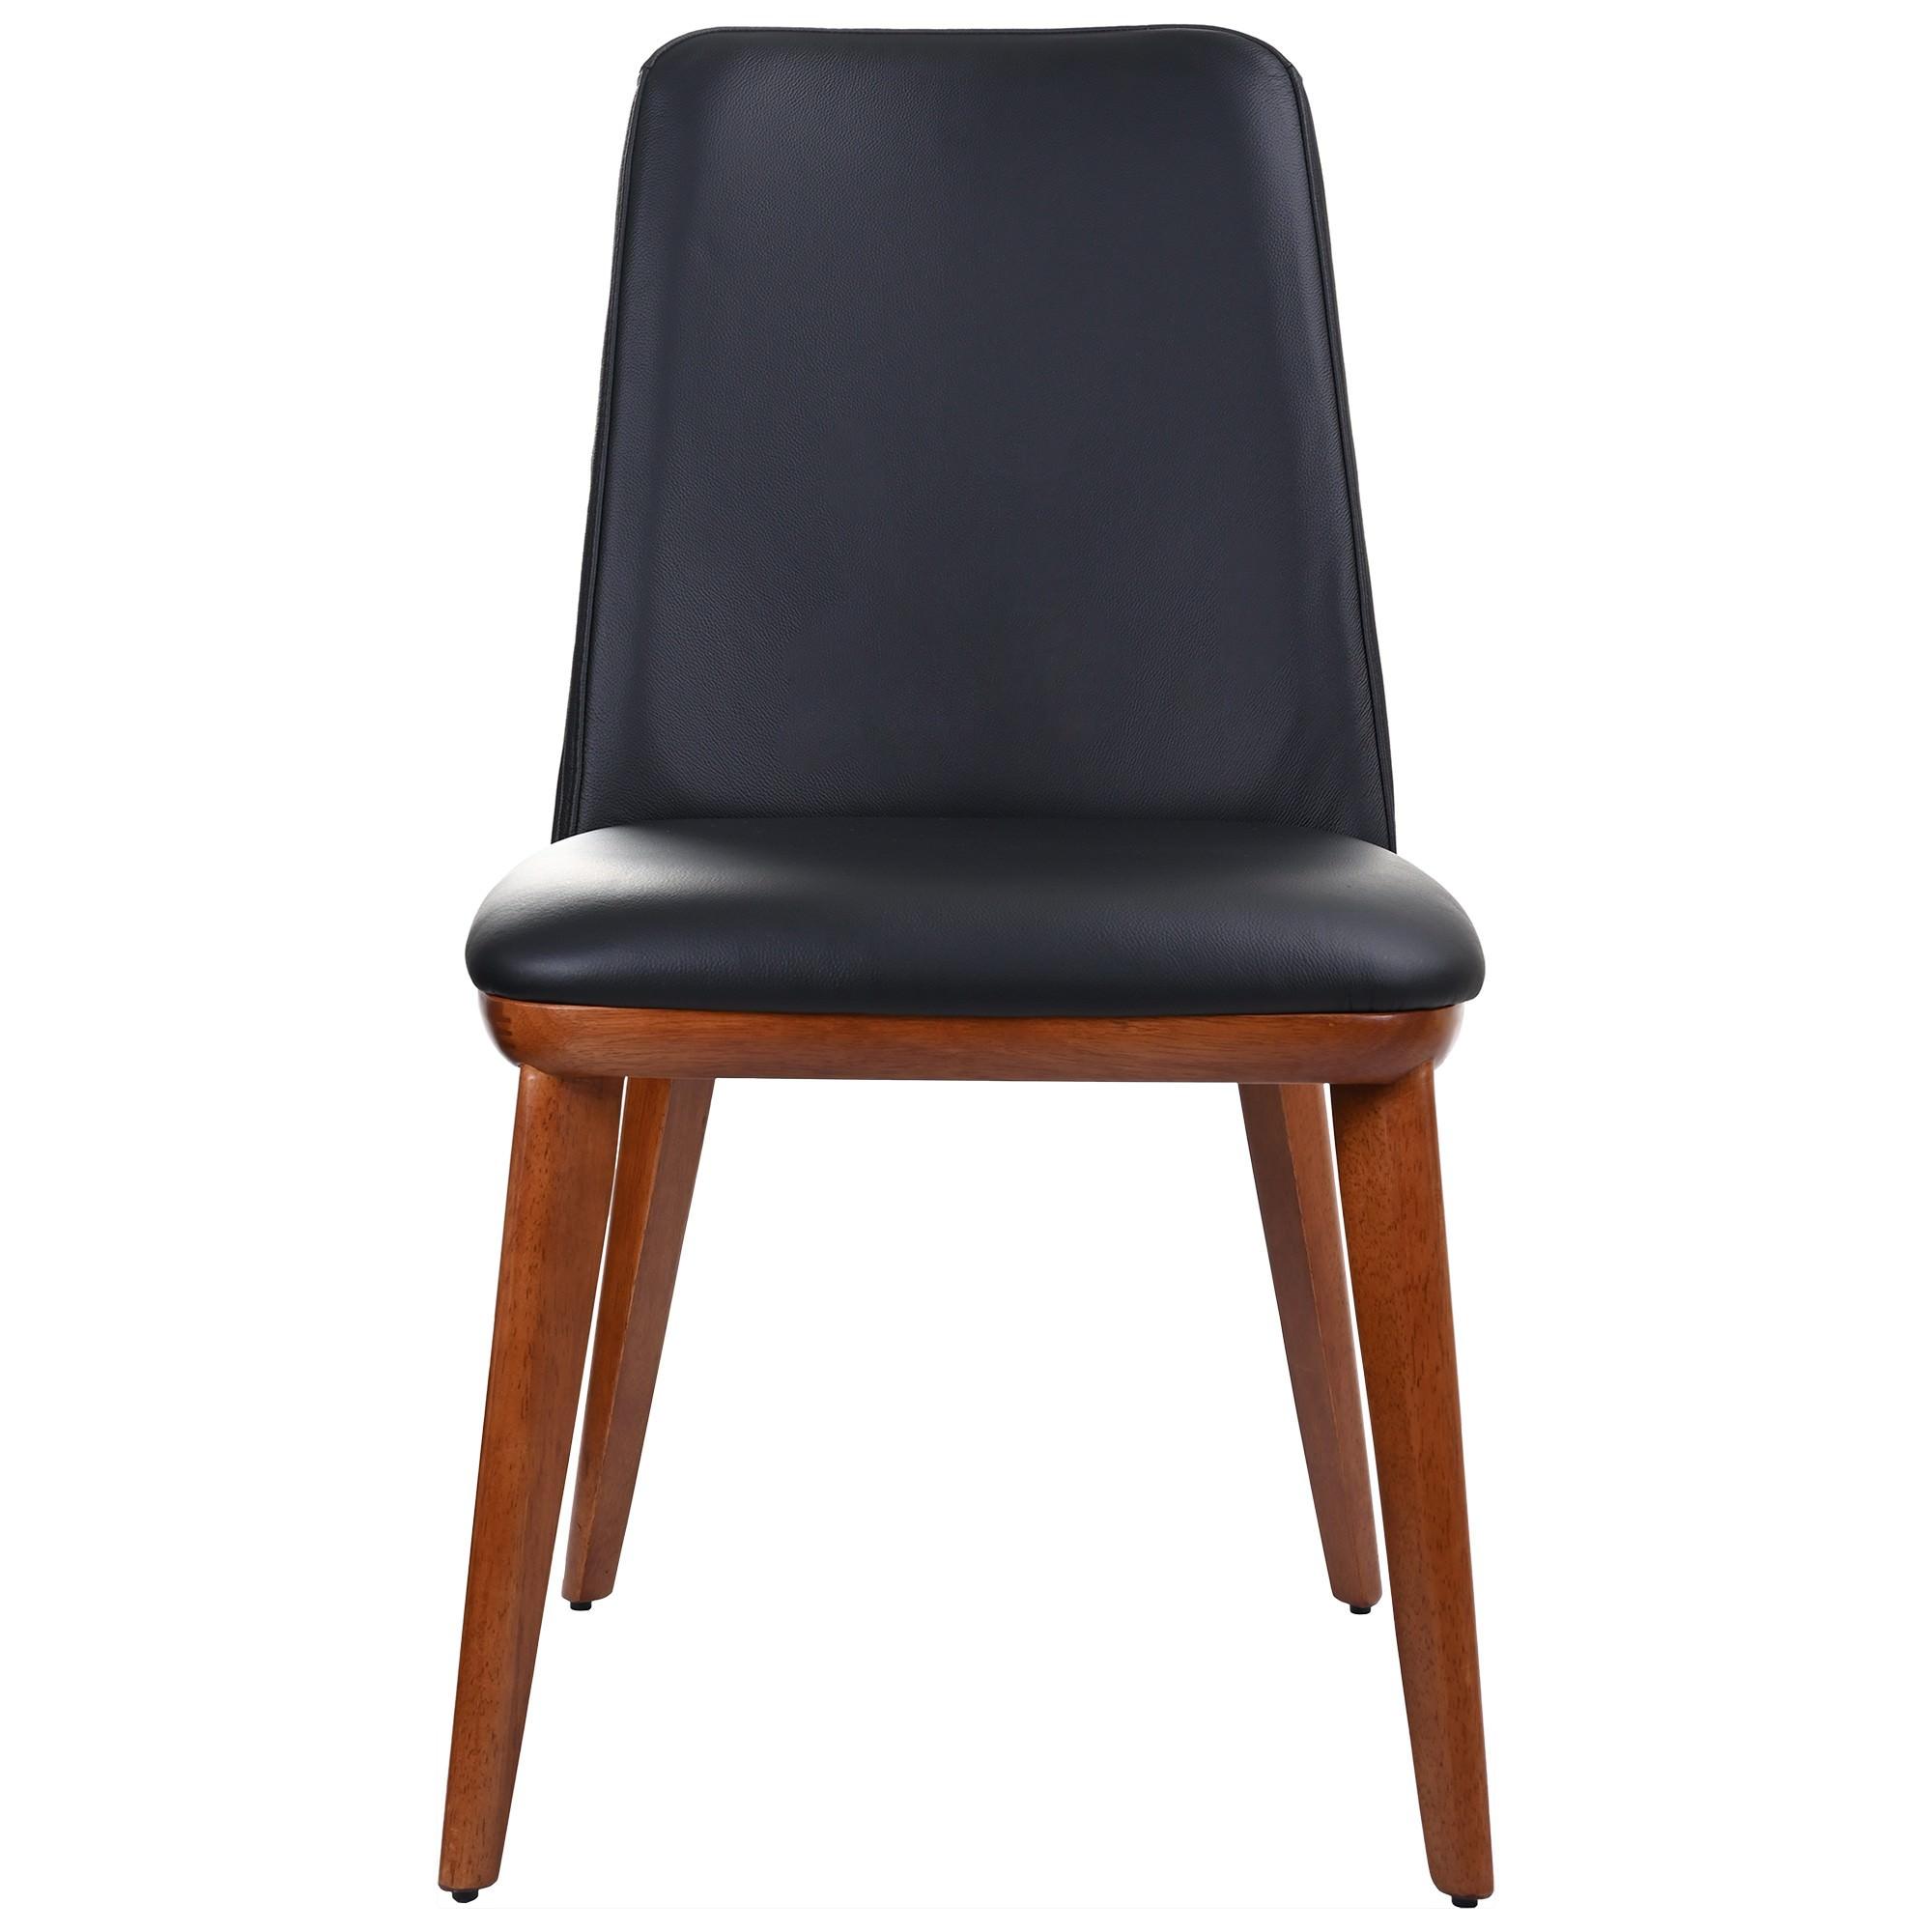 Benato Leather Dining Chair, Black / Blackwood